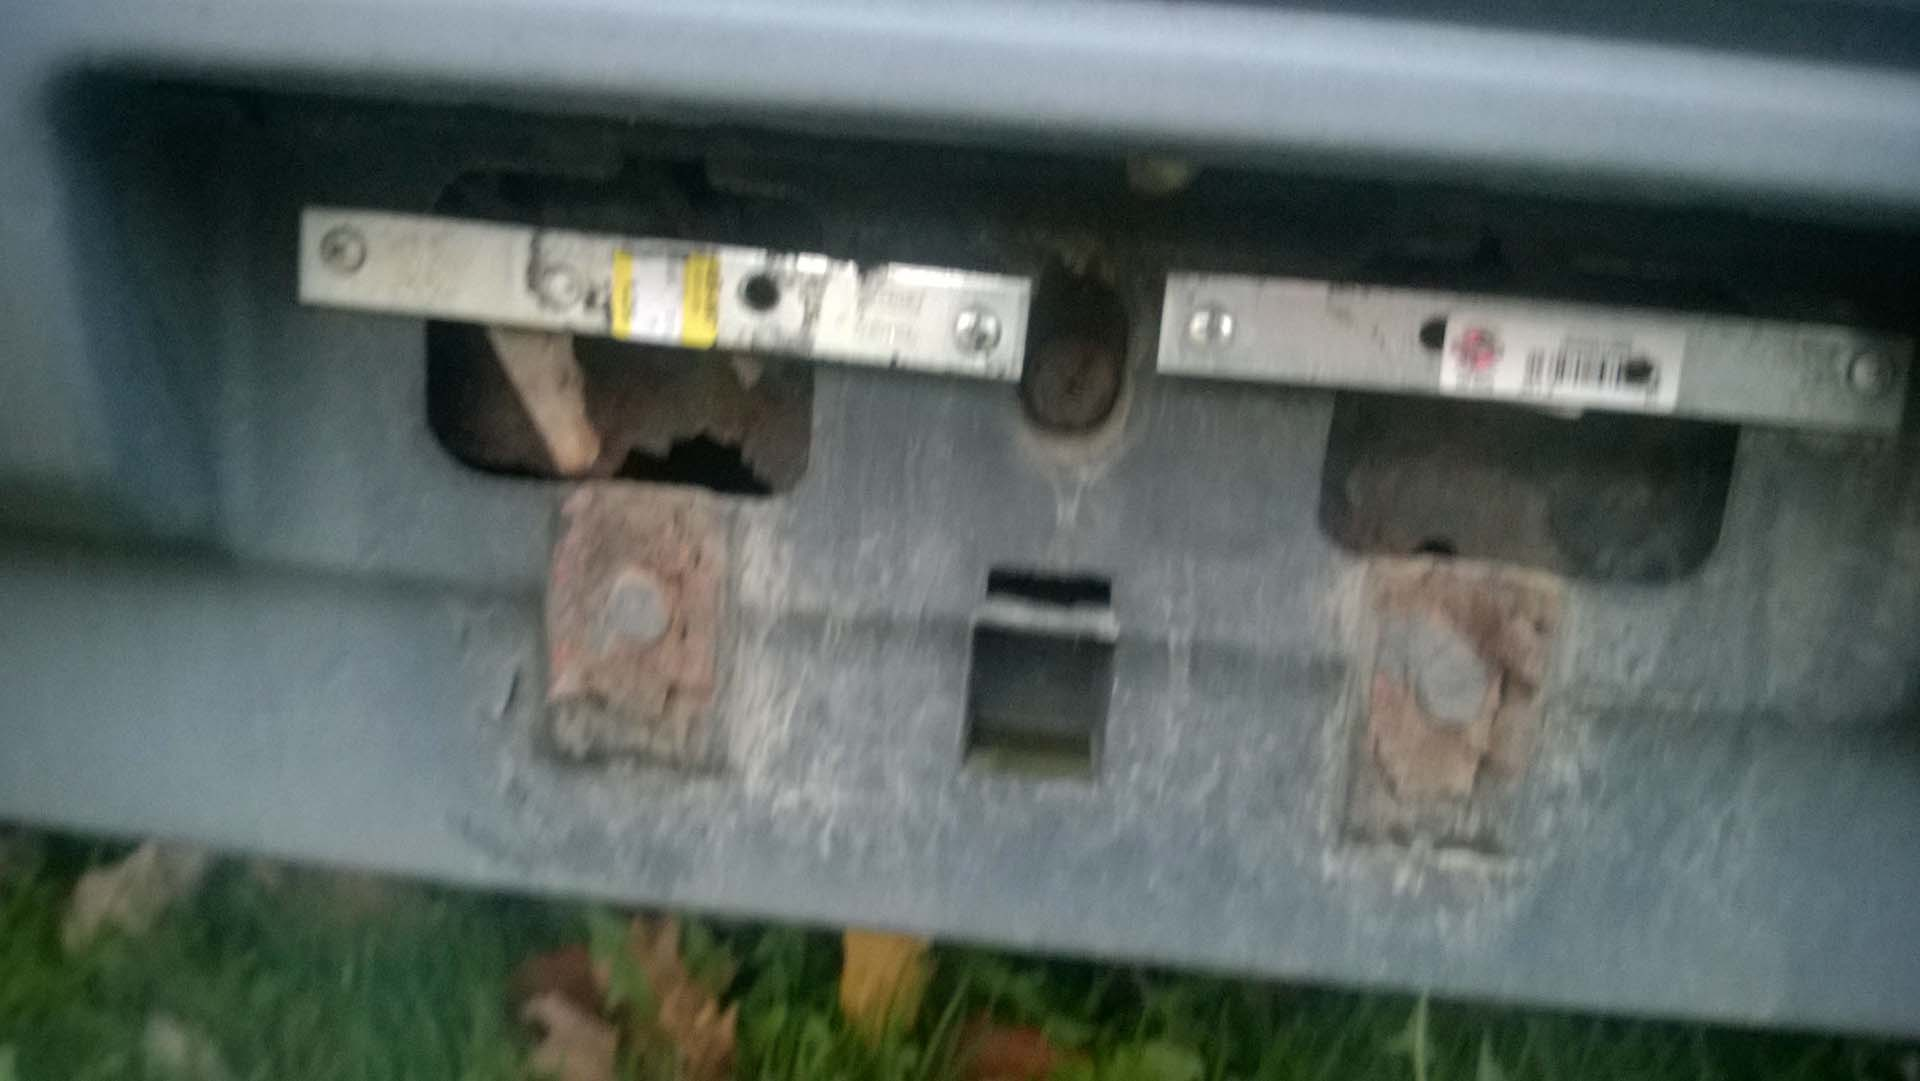 Potential CRX #5 - Damanged License Plate Bracket